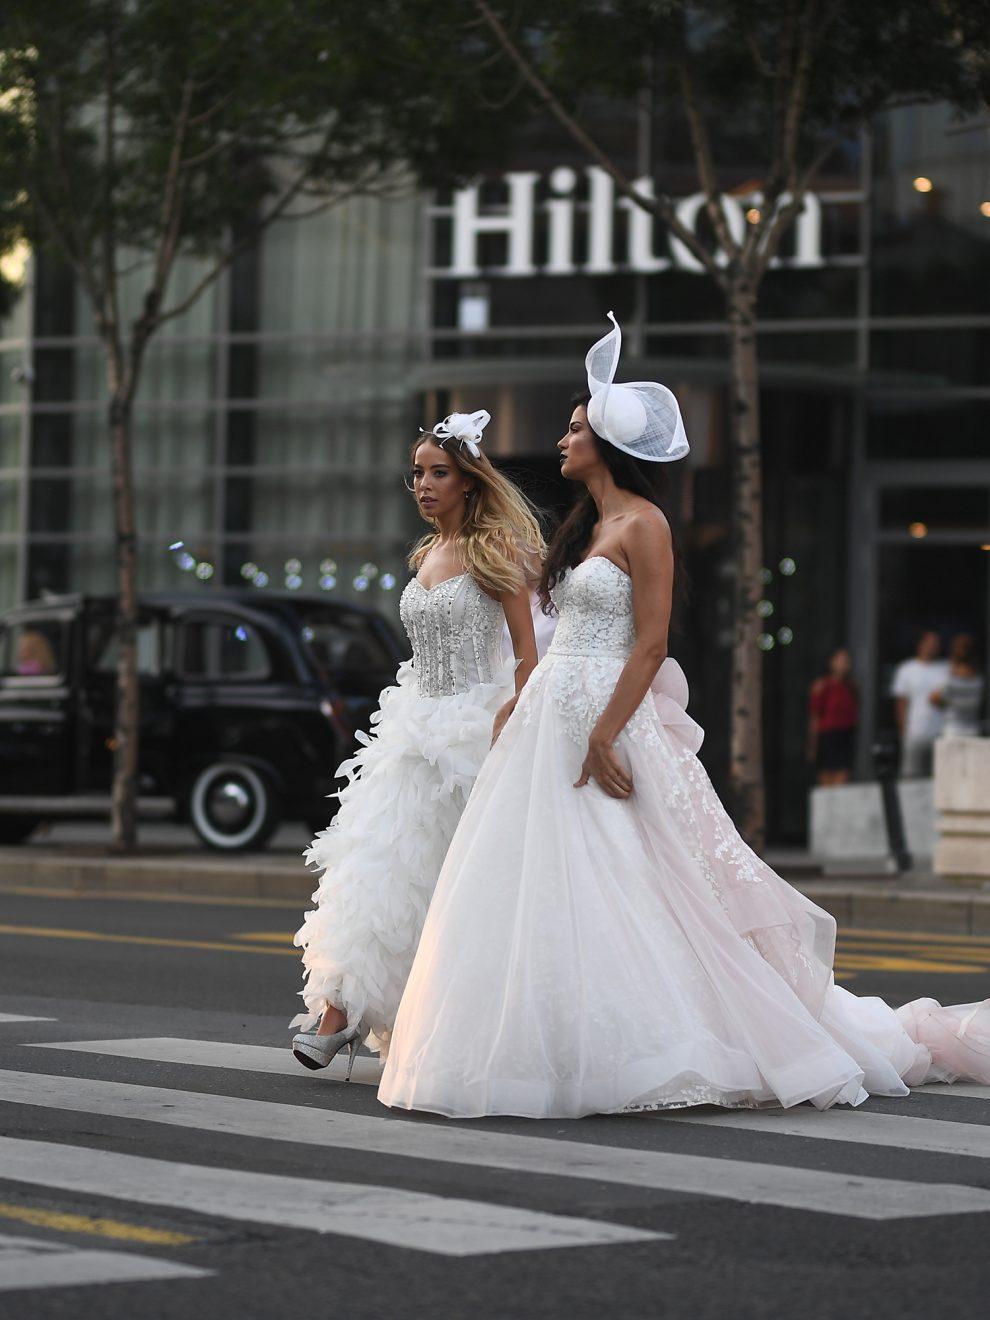 Beogradski sajam venčanja nudi lek protiv stresa mladenaca